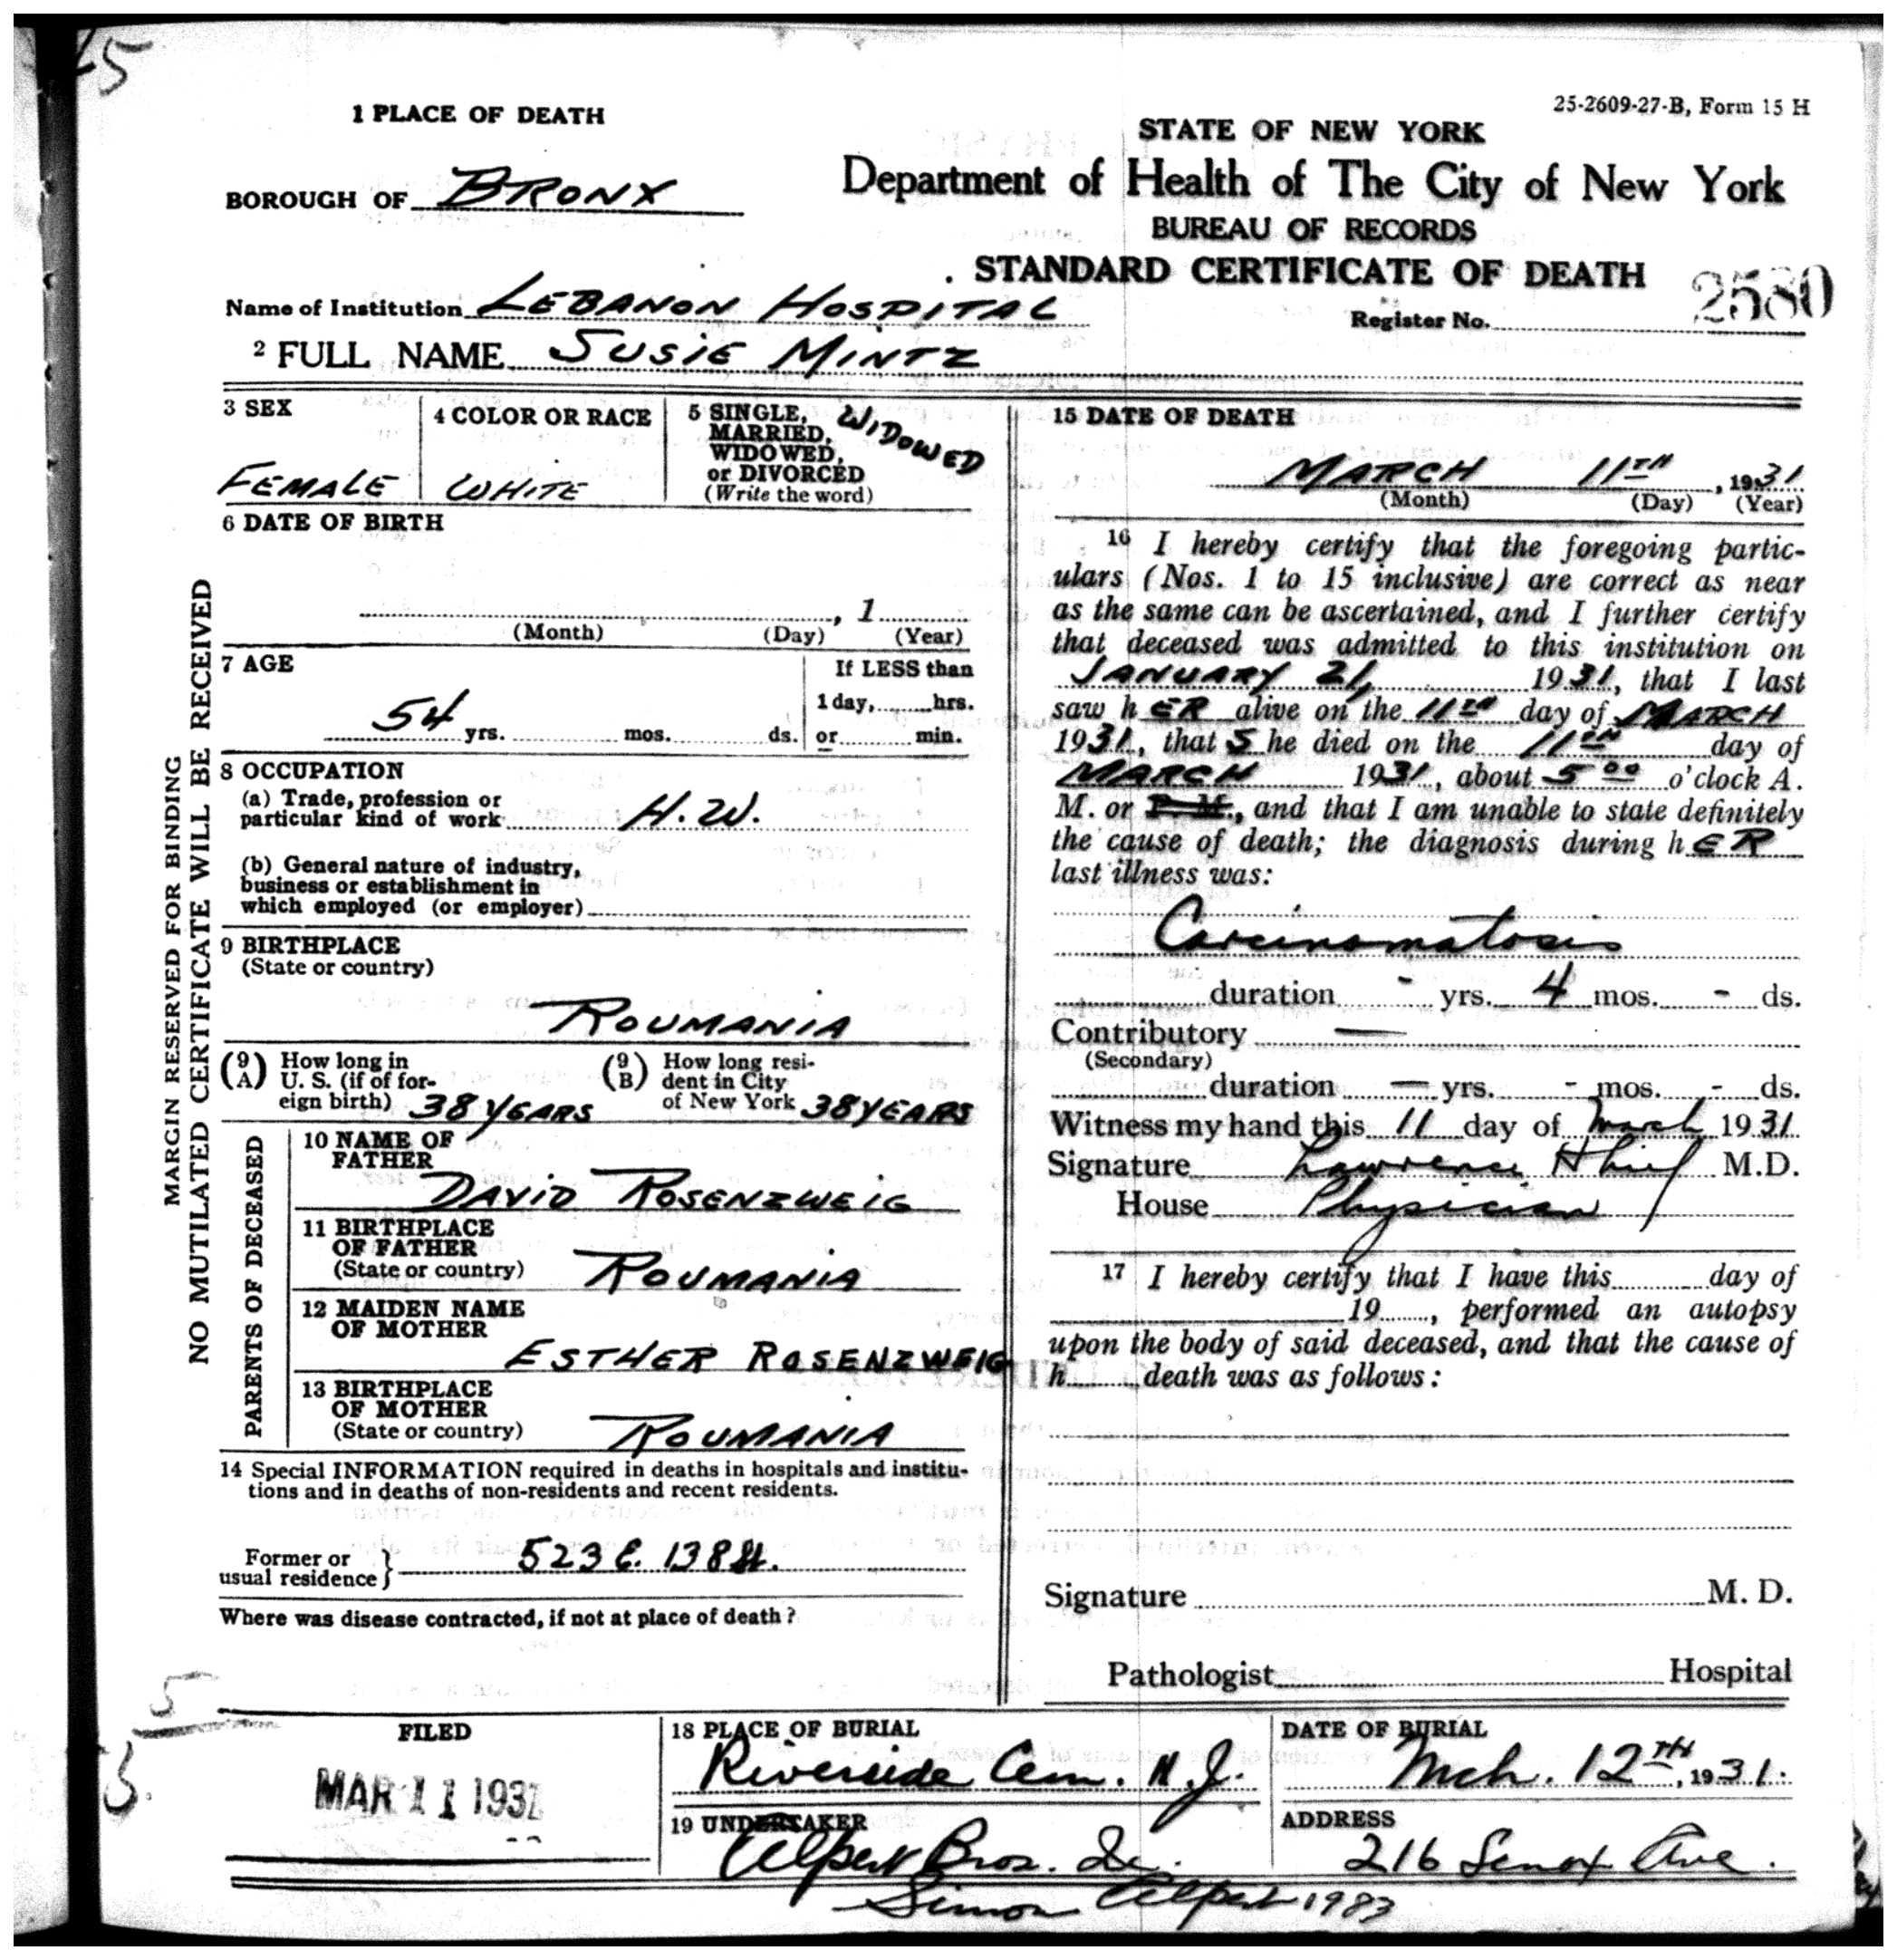 Death certificate brotmanblog a family journey page 3 susie mintz death certificate xflitez Gallery